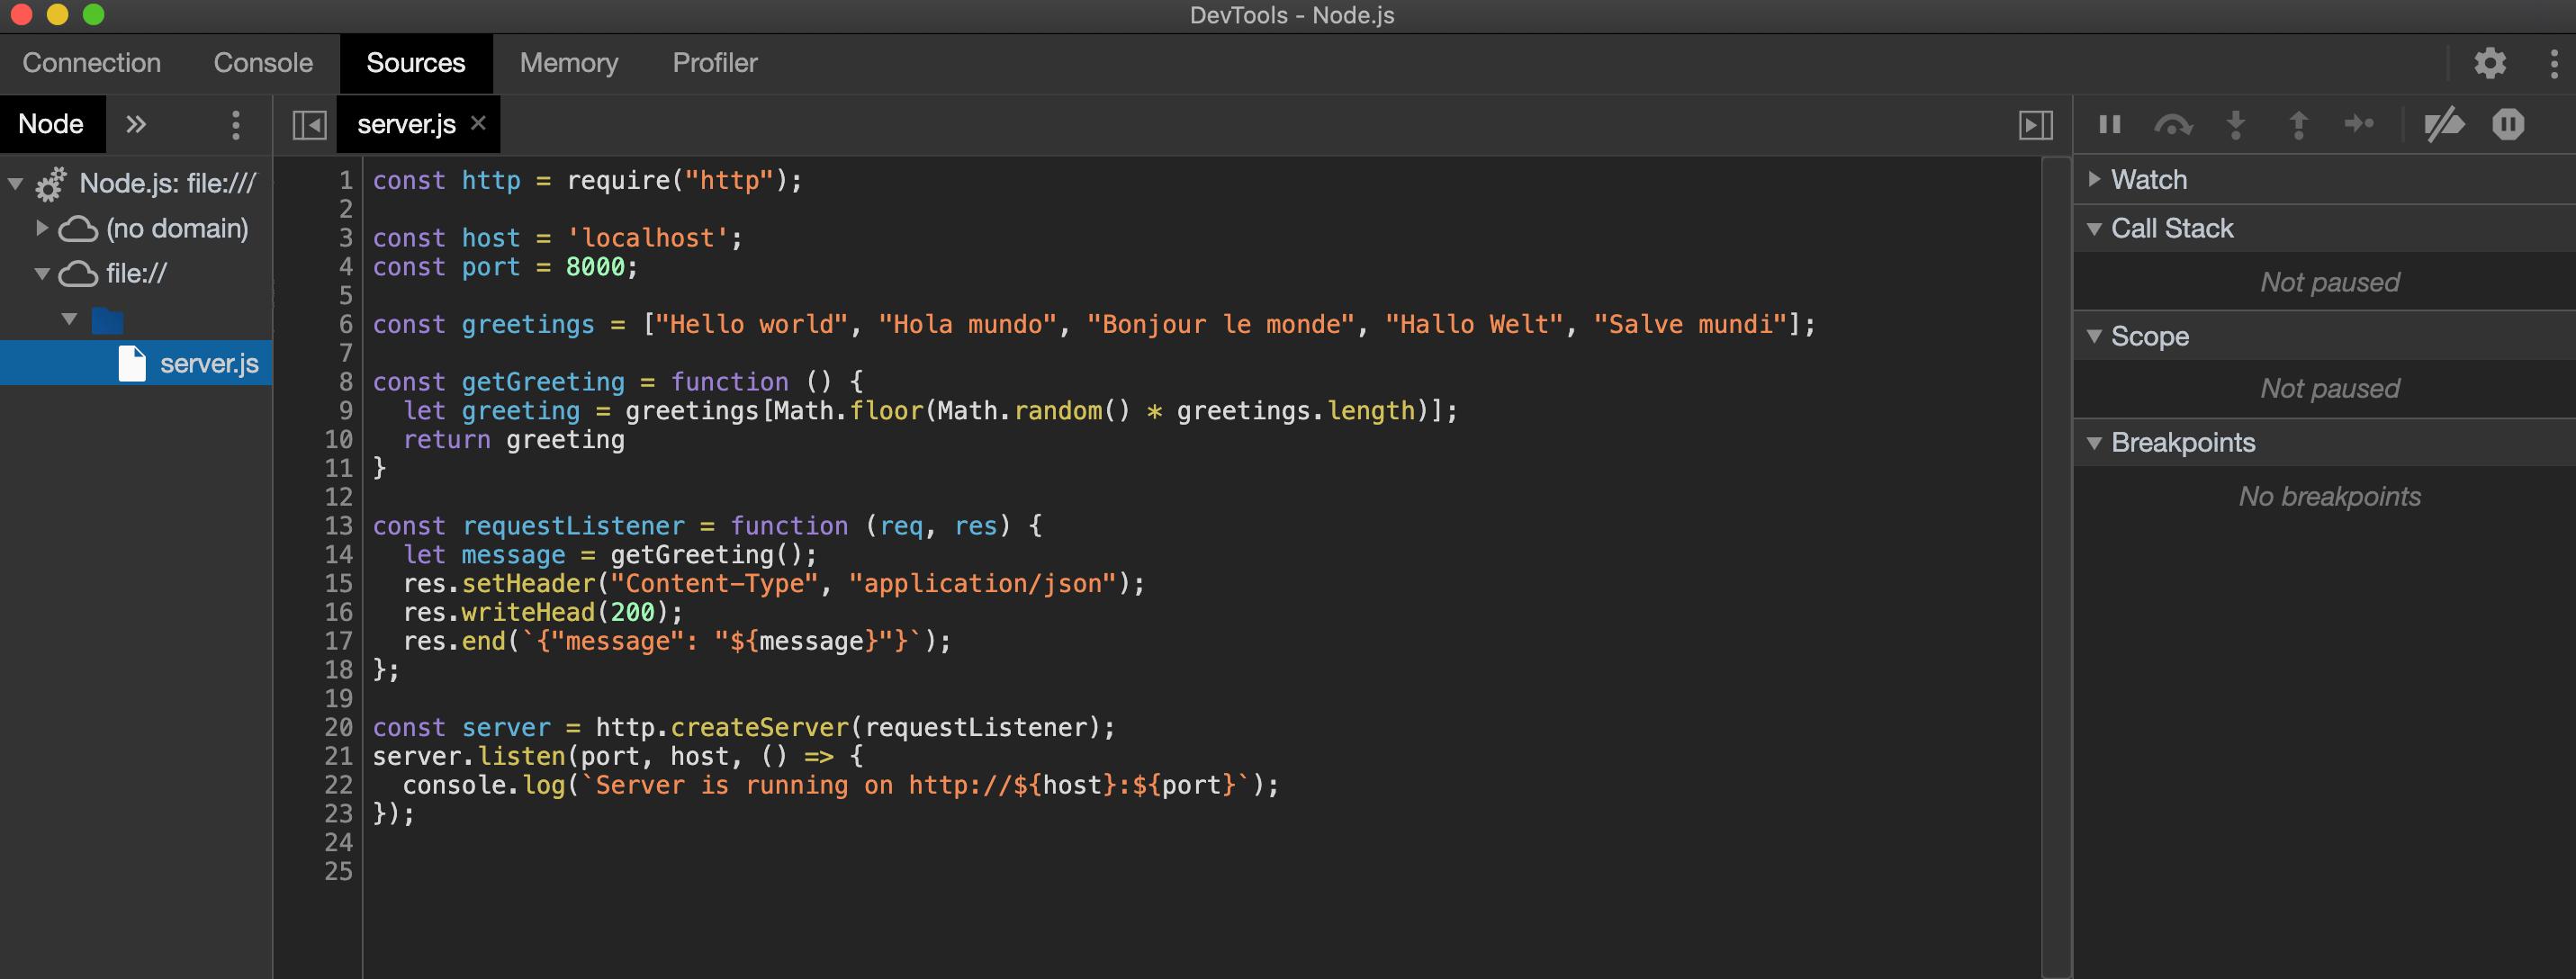 Screenshot of debugger window's Sources tab